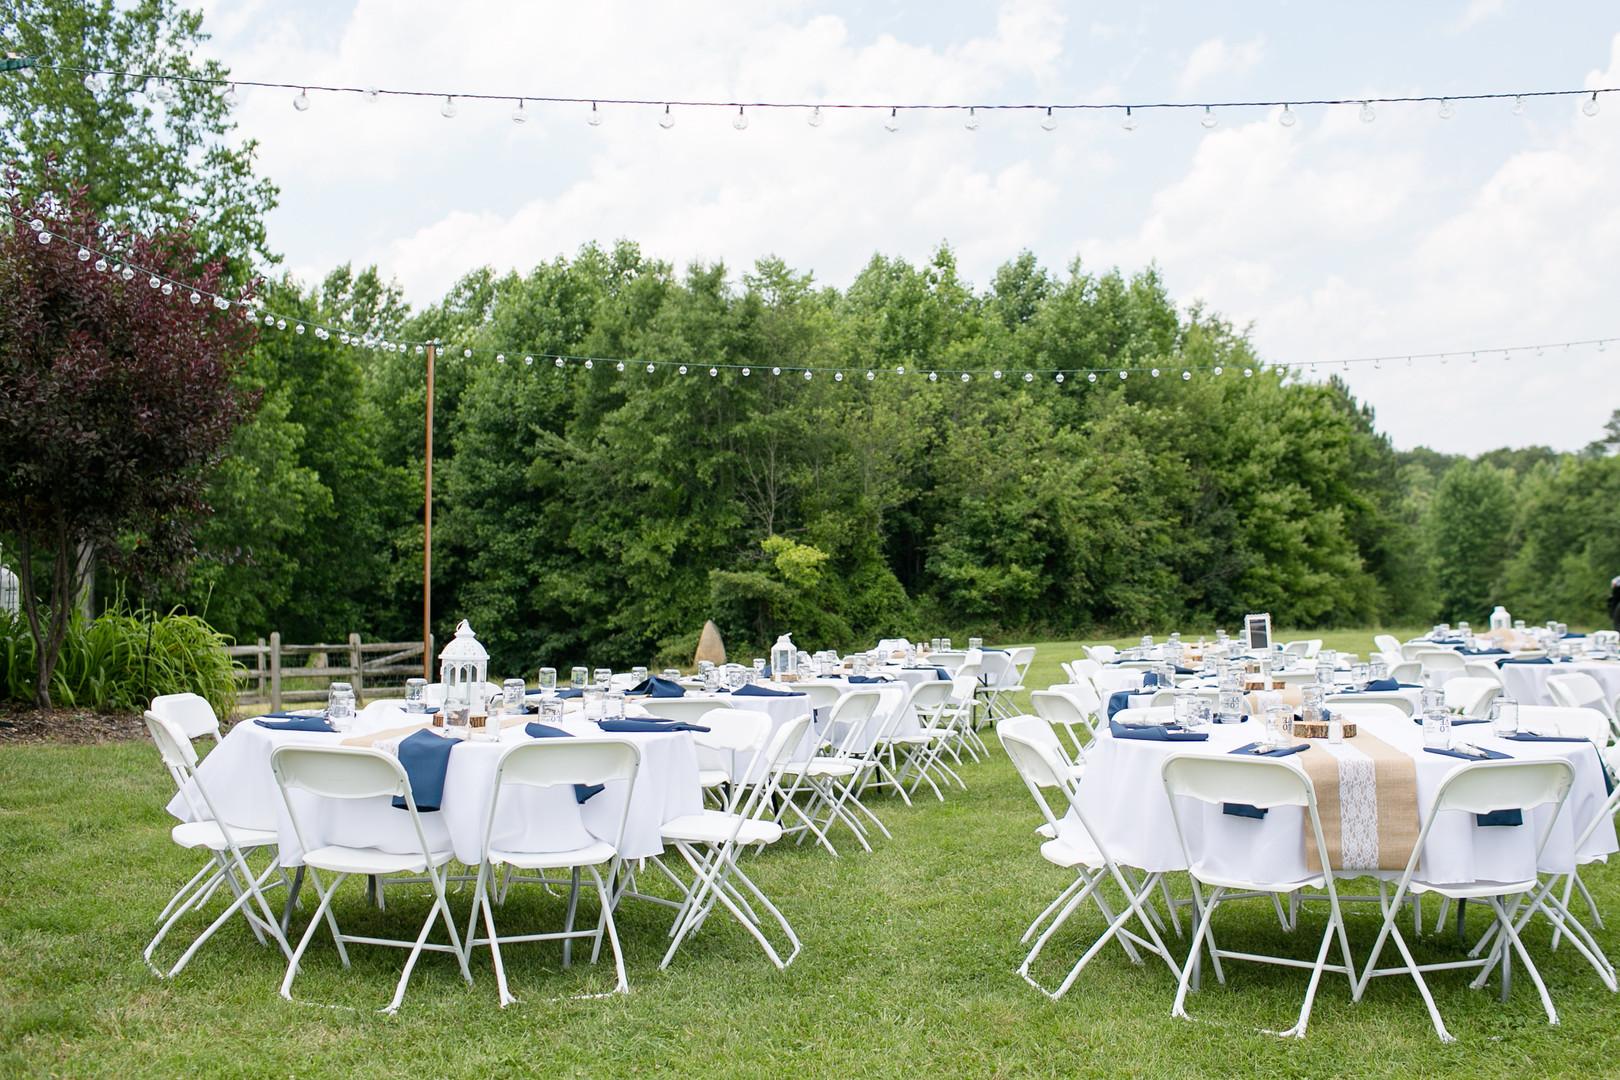 brandy-cameron-wedding-664.jpg